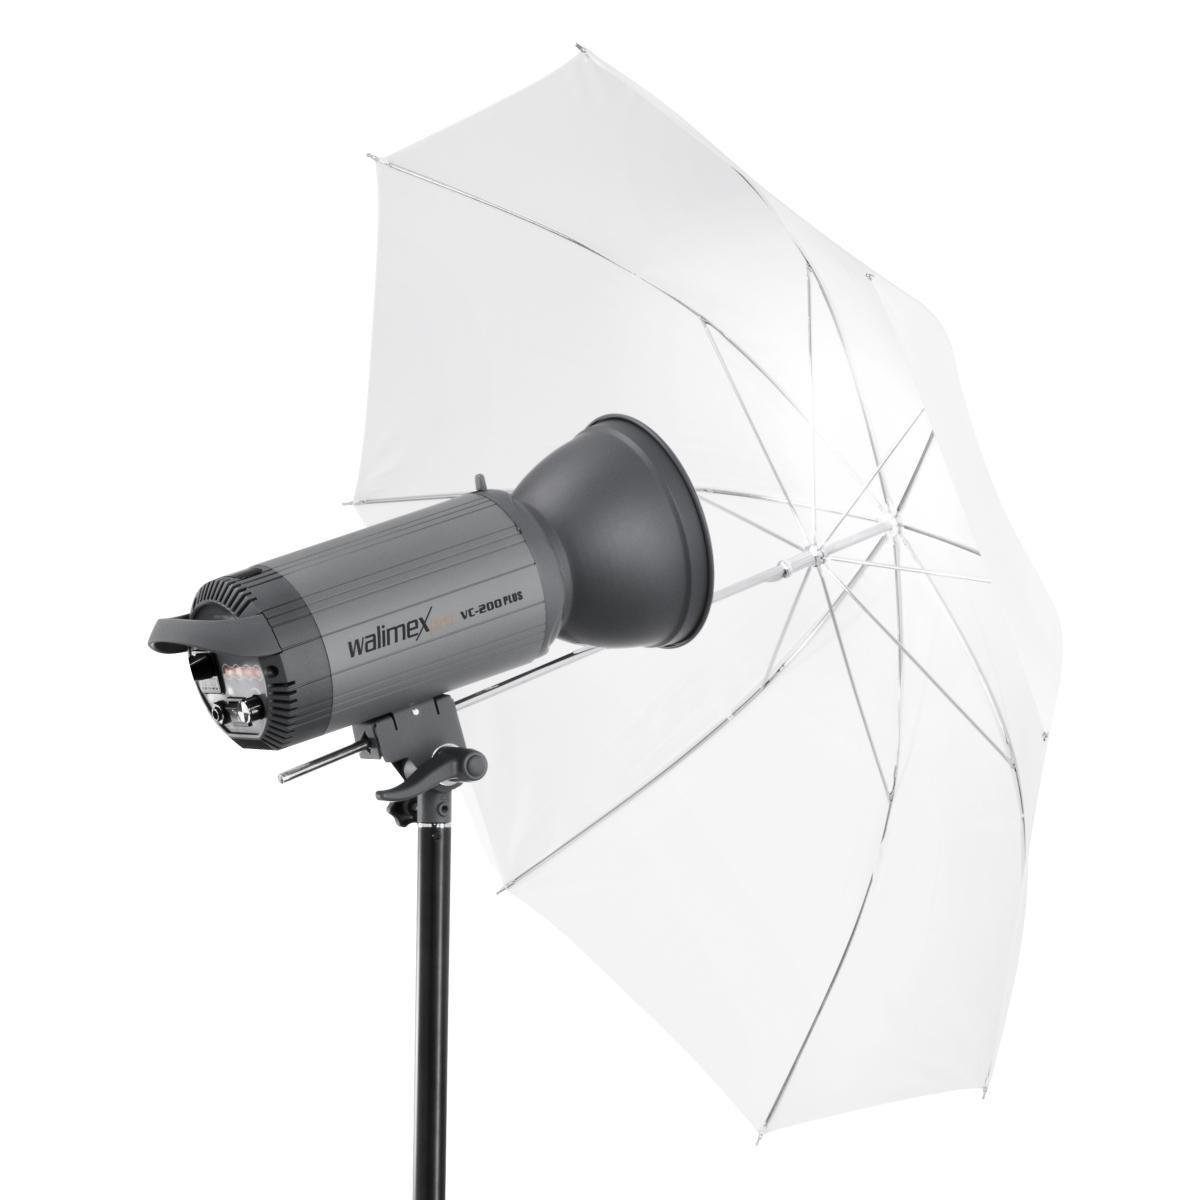 Walimex Pro 2-in-1 reflex//translucent umbrella 109 cm white